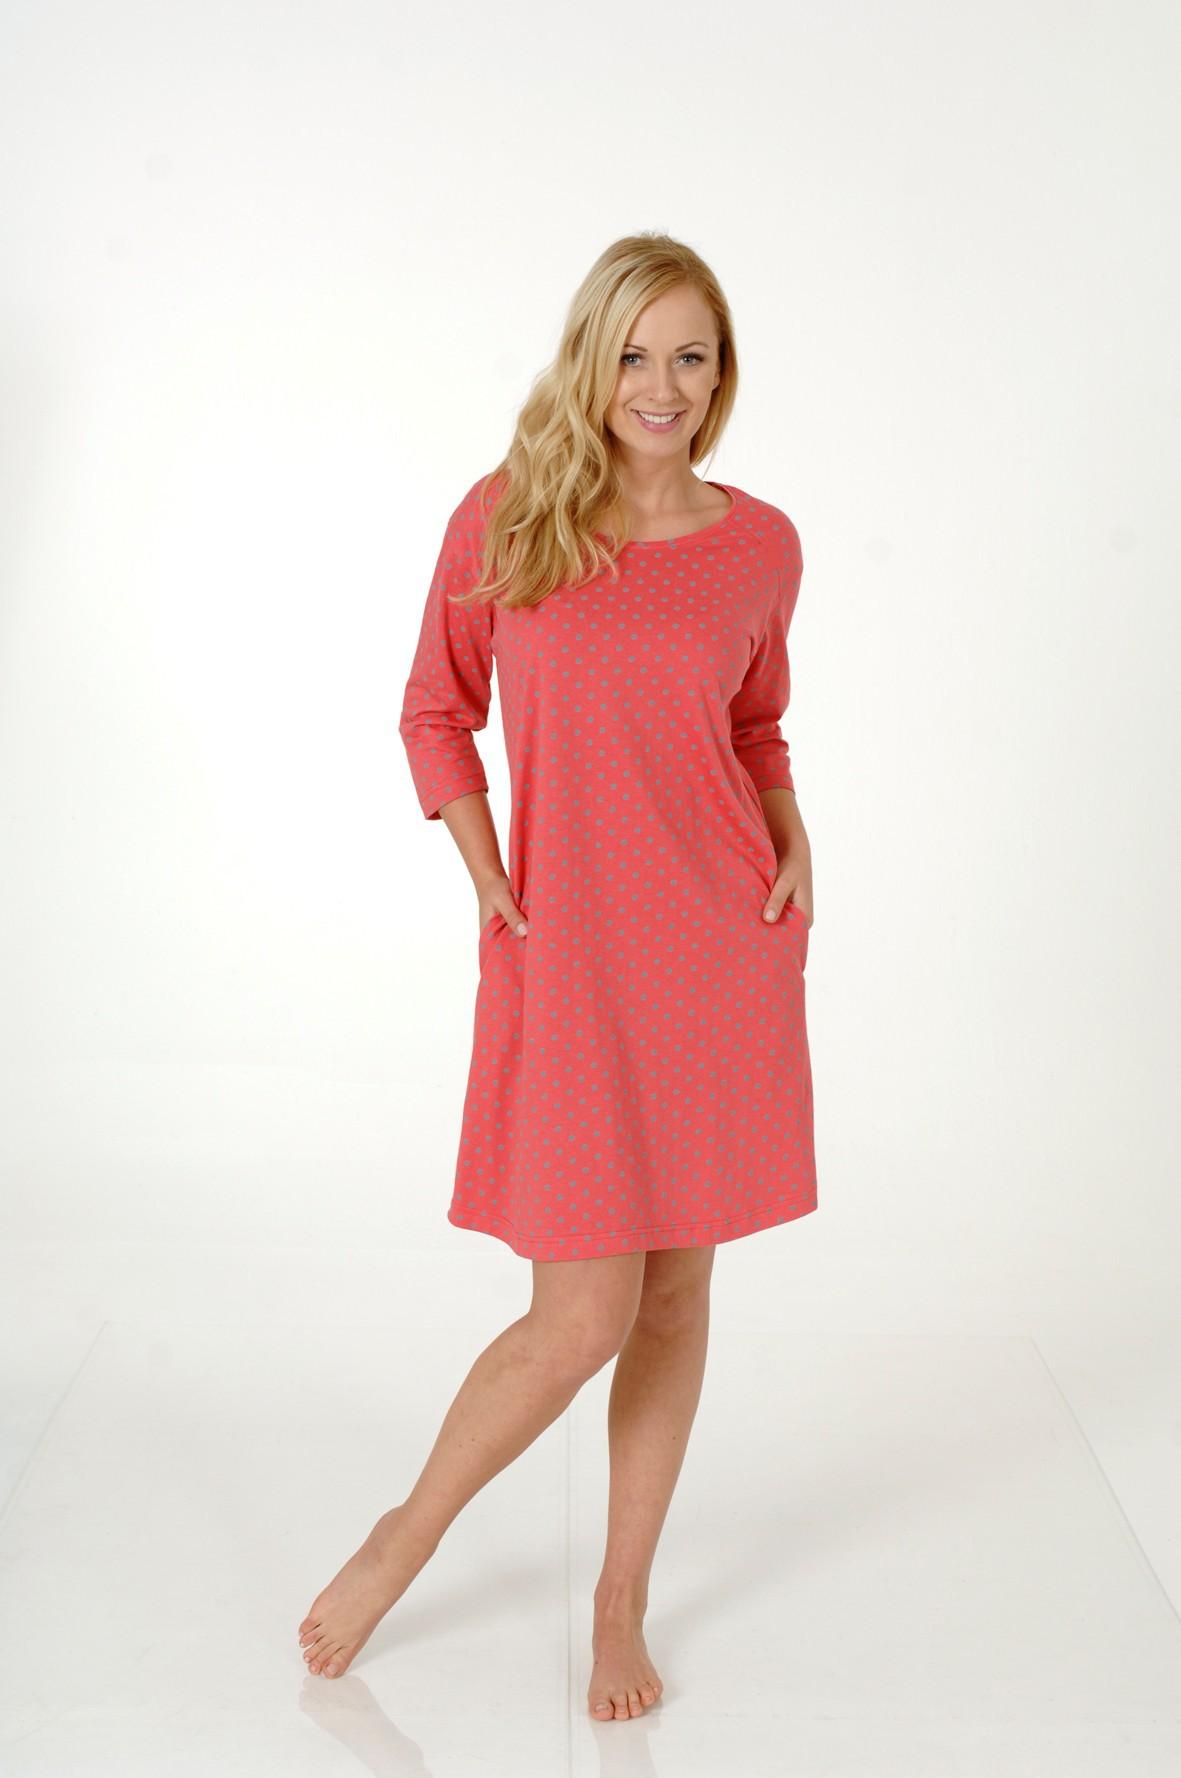 Damen Kurznachthemd, 3/4-Arm, Bigshirt, Sleepshirt, 213 90 530 001